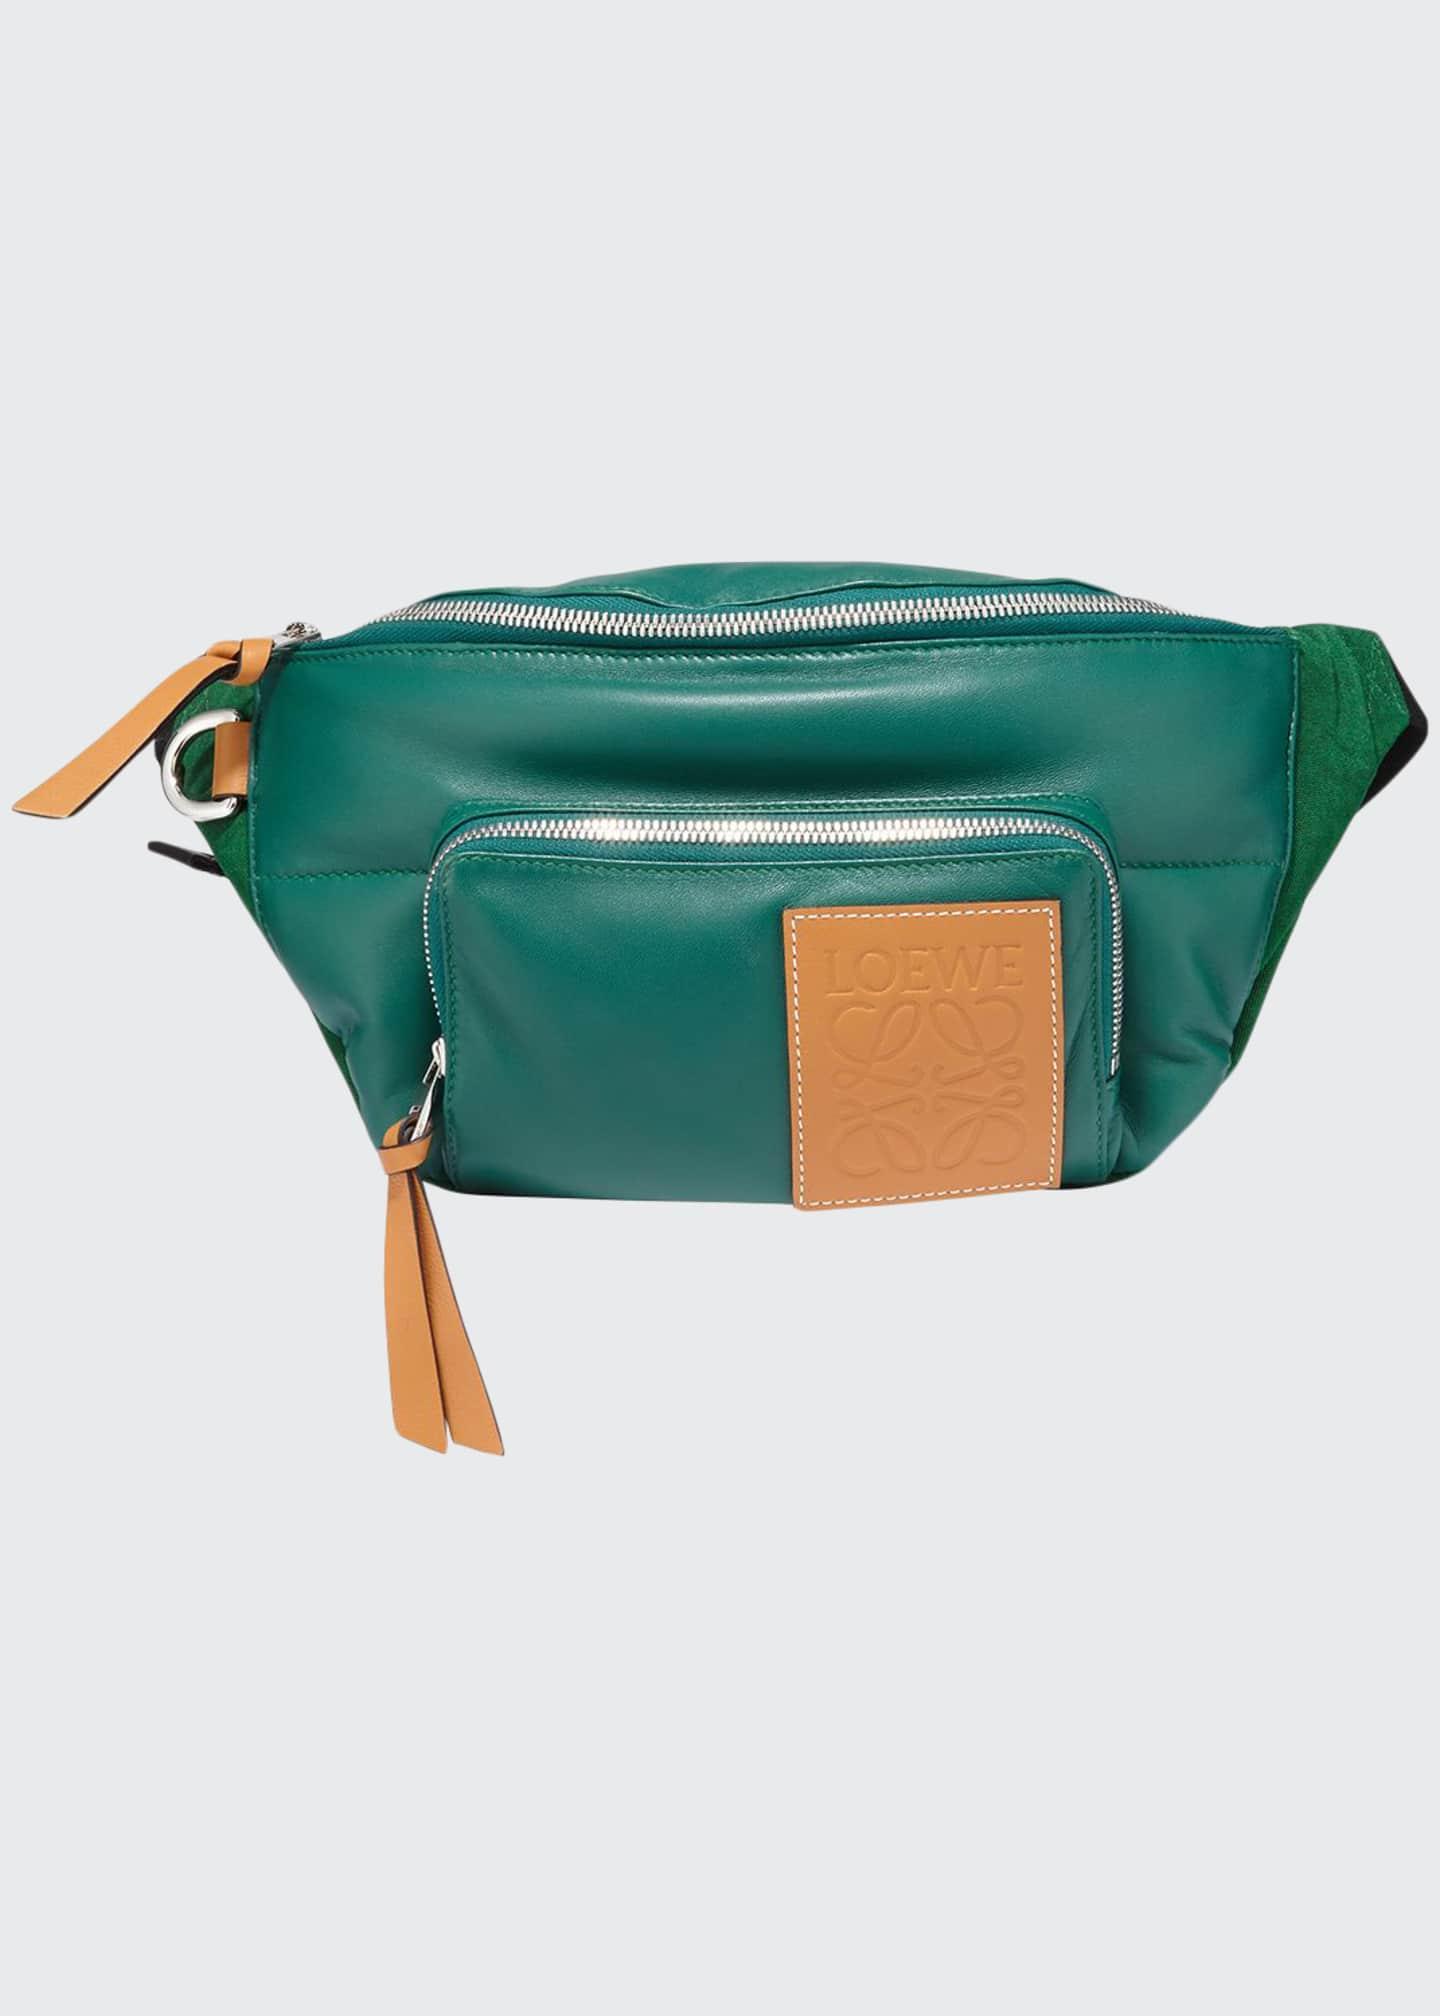 Loewe Men's Puffy Colorblock Lamb Leather Belt Bag/Fanny